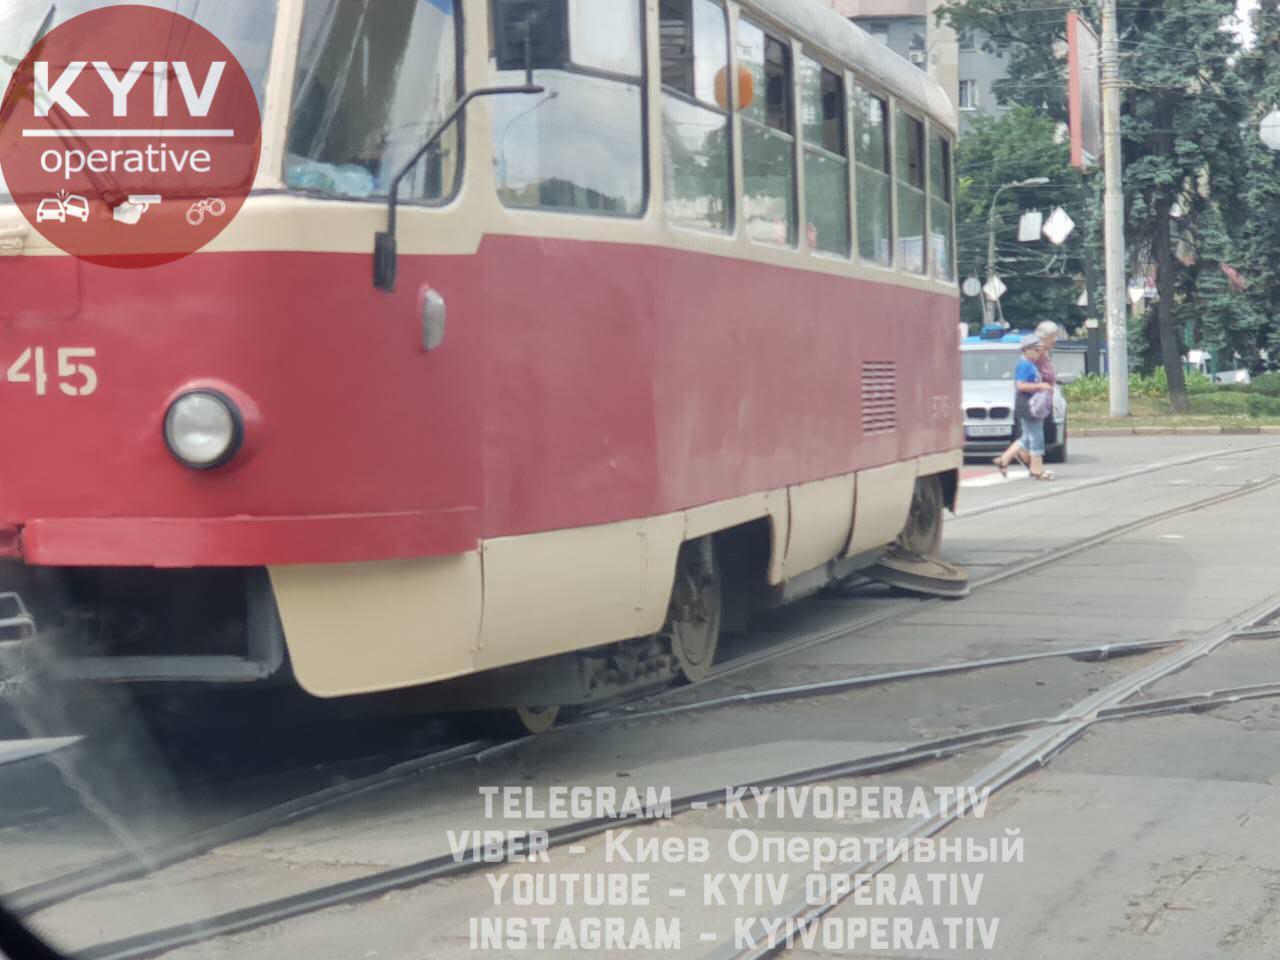 Фото: Telegram-канал KyivOperativ